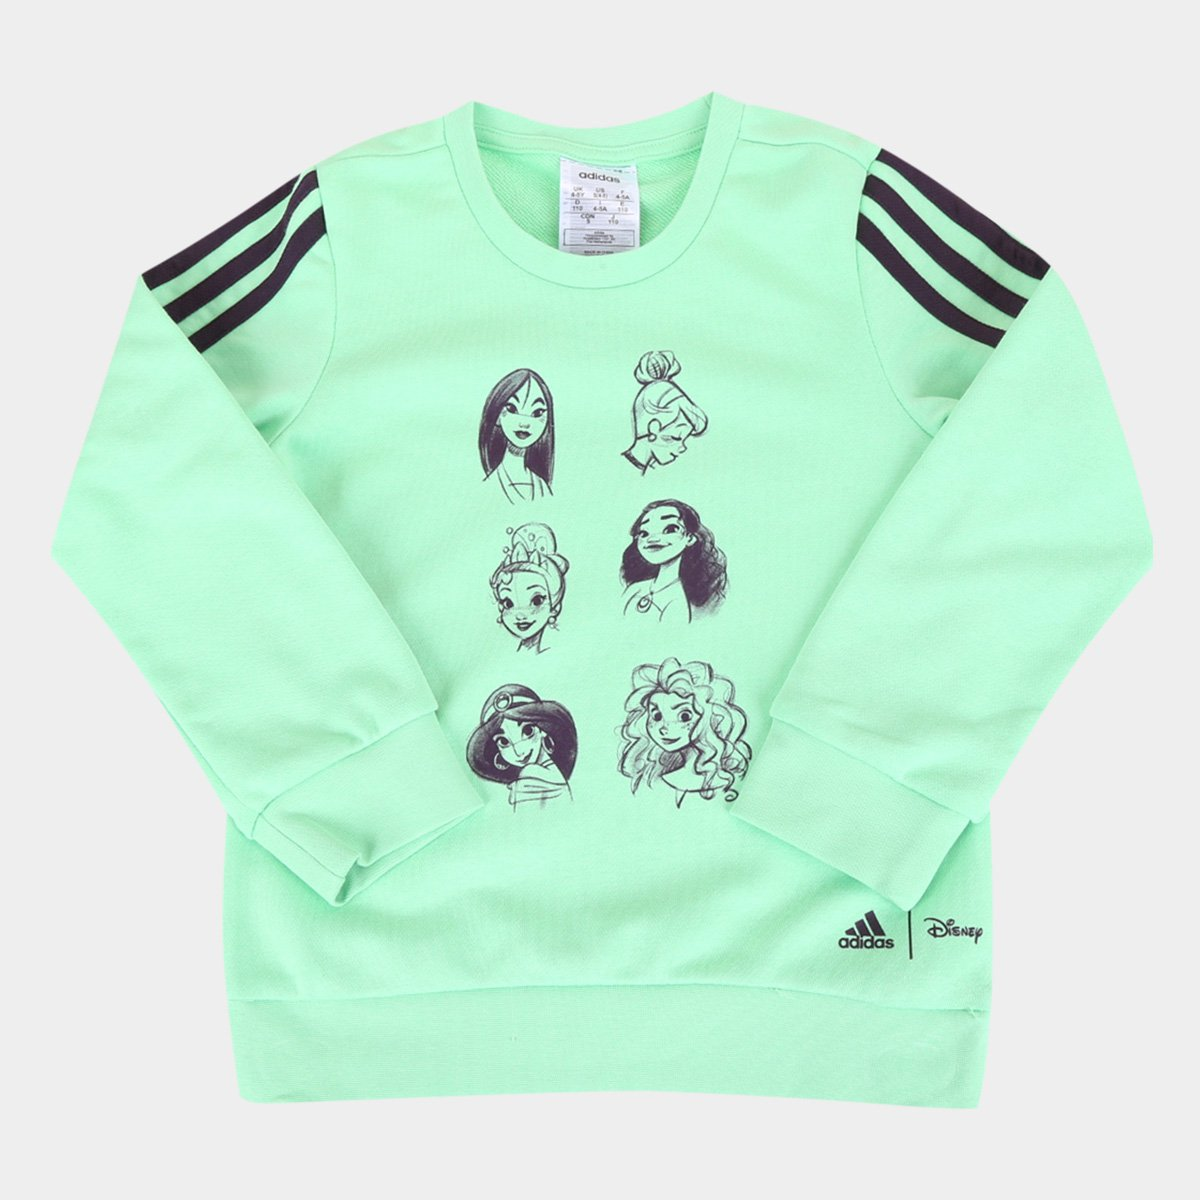 Moletom Infantil Adidas Princesas Disney